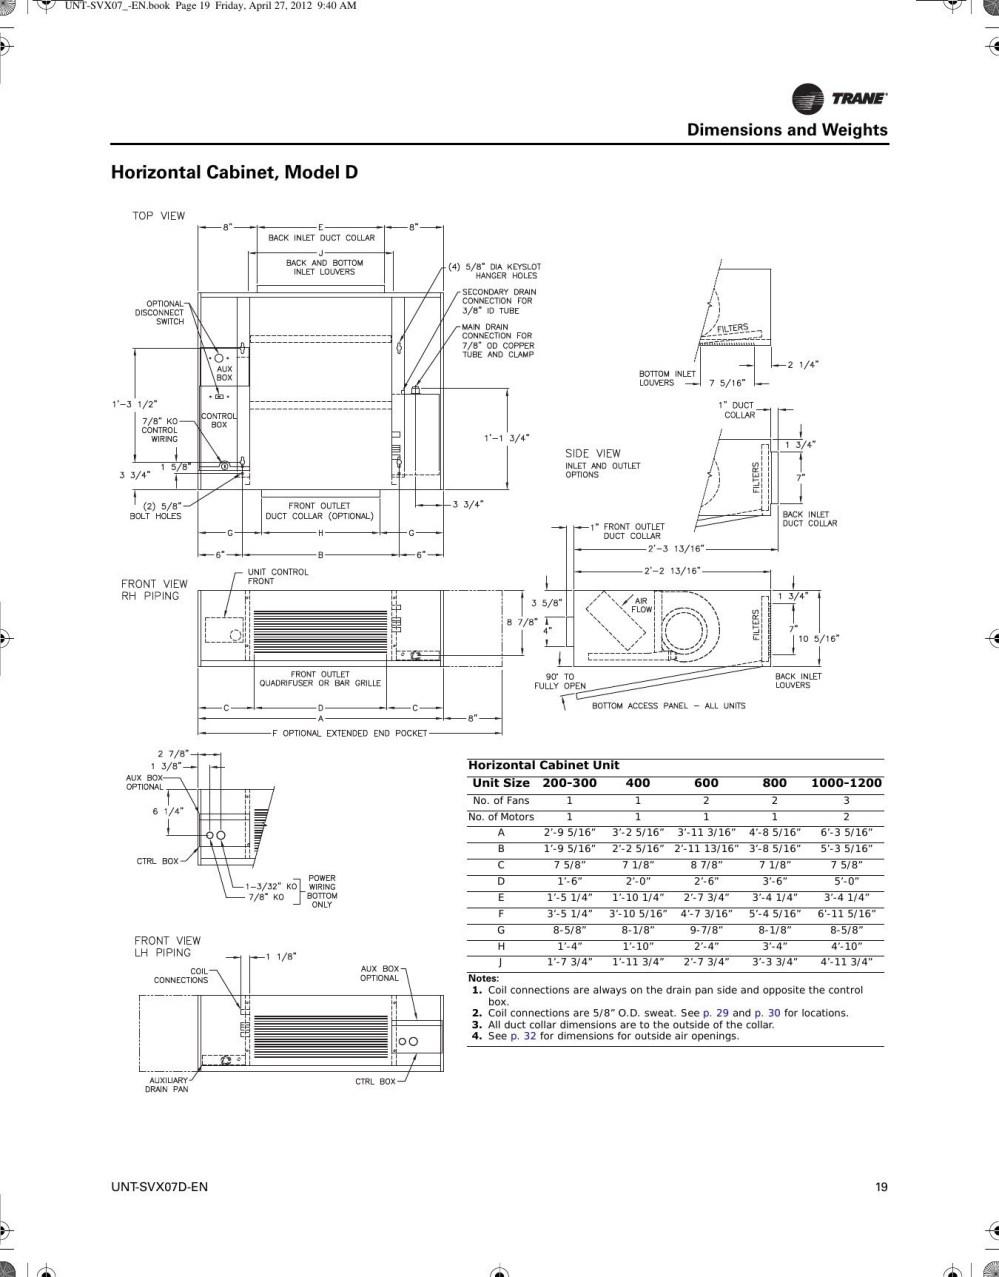 medium resolution of 1990 dodge b250 van wiring diagram schematic